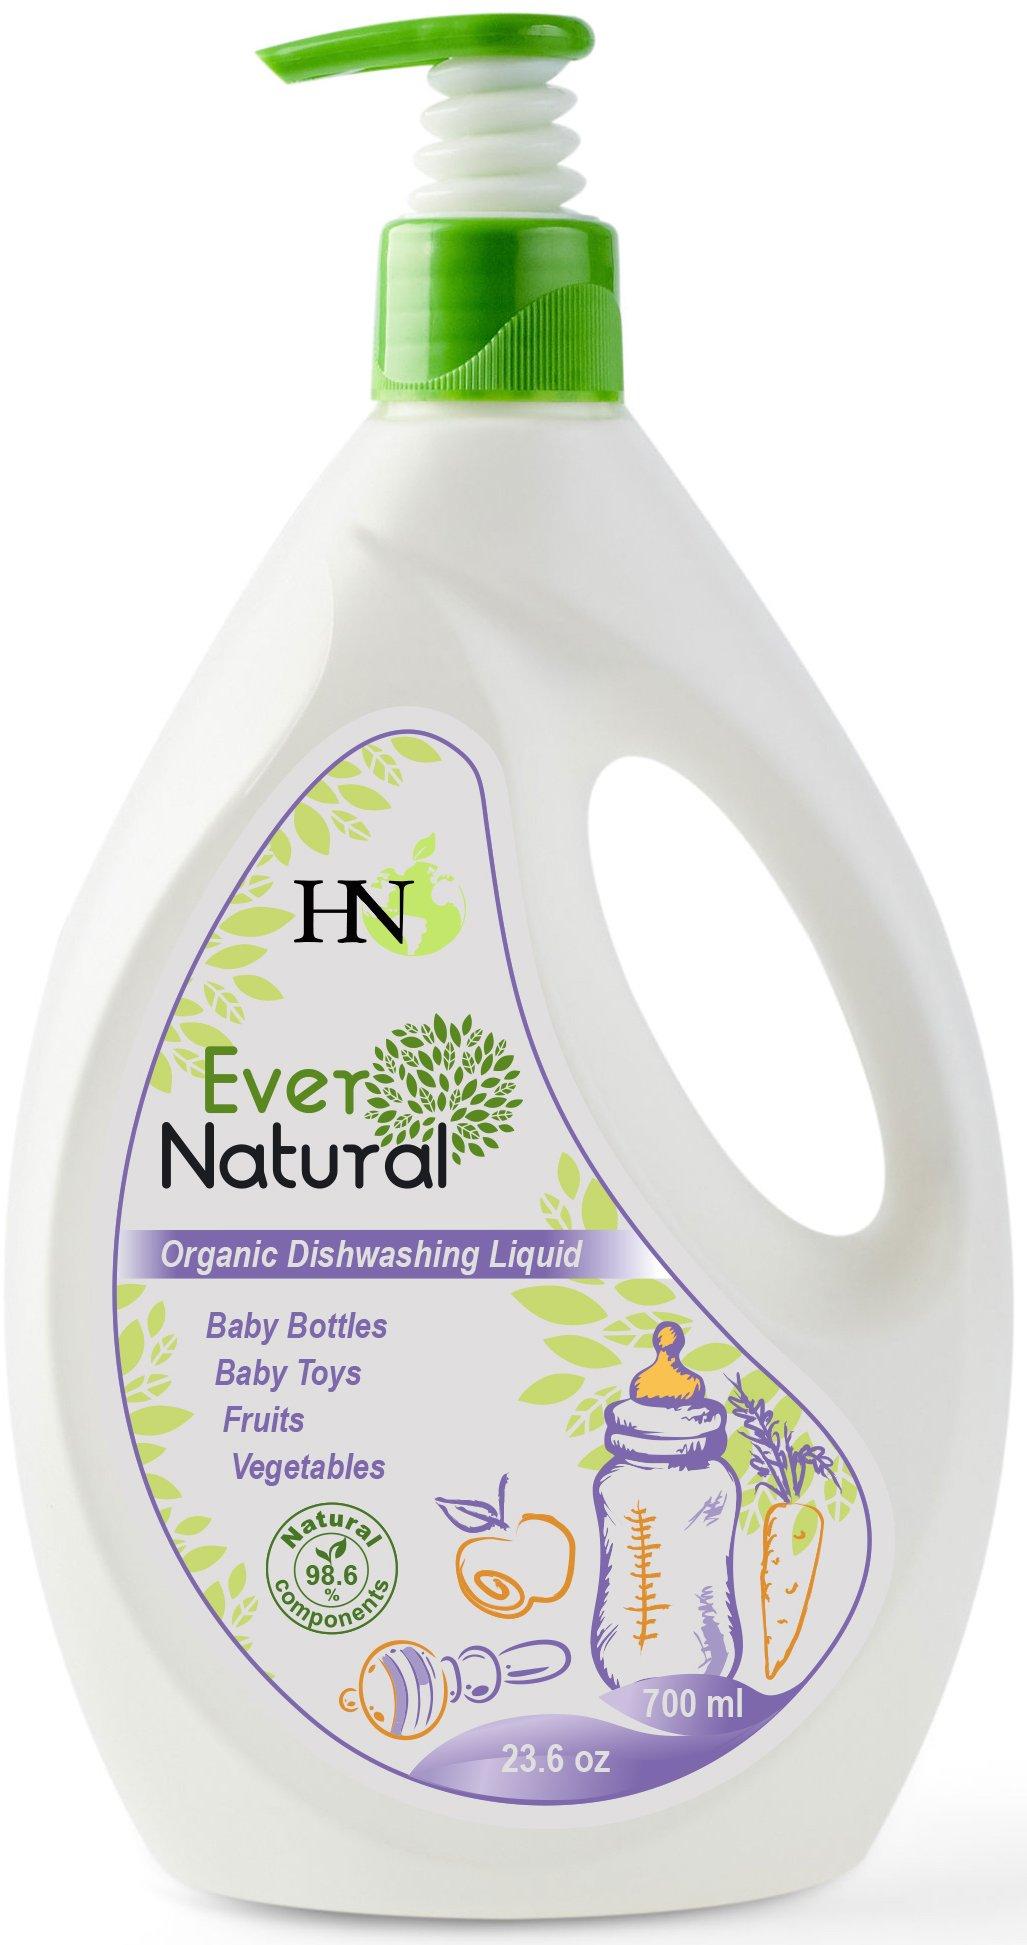 Organic Baby Dishwashing Cleaning Liquid - Fruit Vegetable Washing Liquid Safe for Kids Adults-Dishwashing Detergent Liquid for Baby Bottles Toys and for Fruits and Vegetables Baby Guard